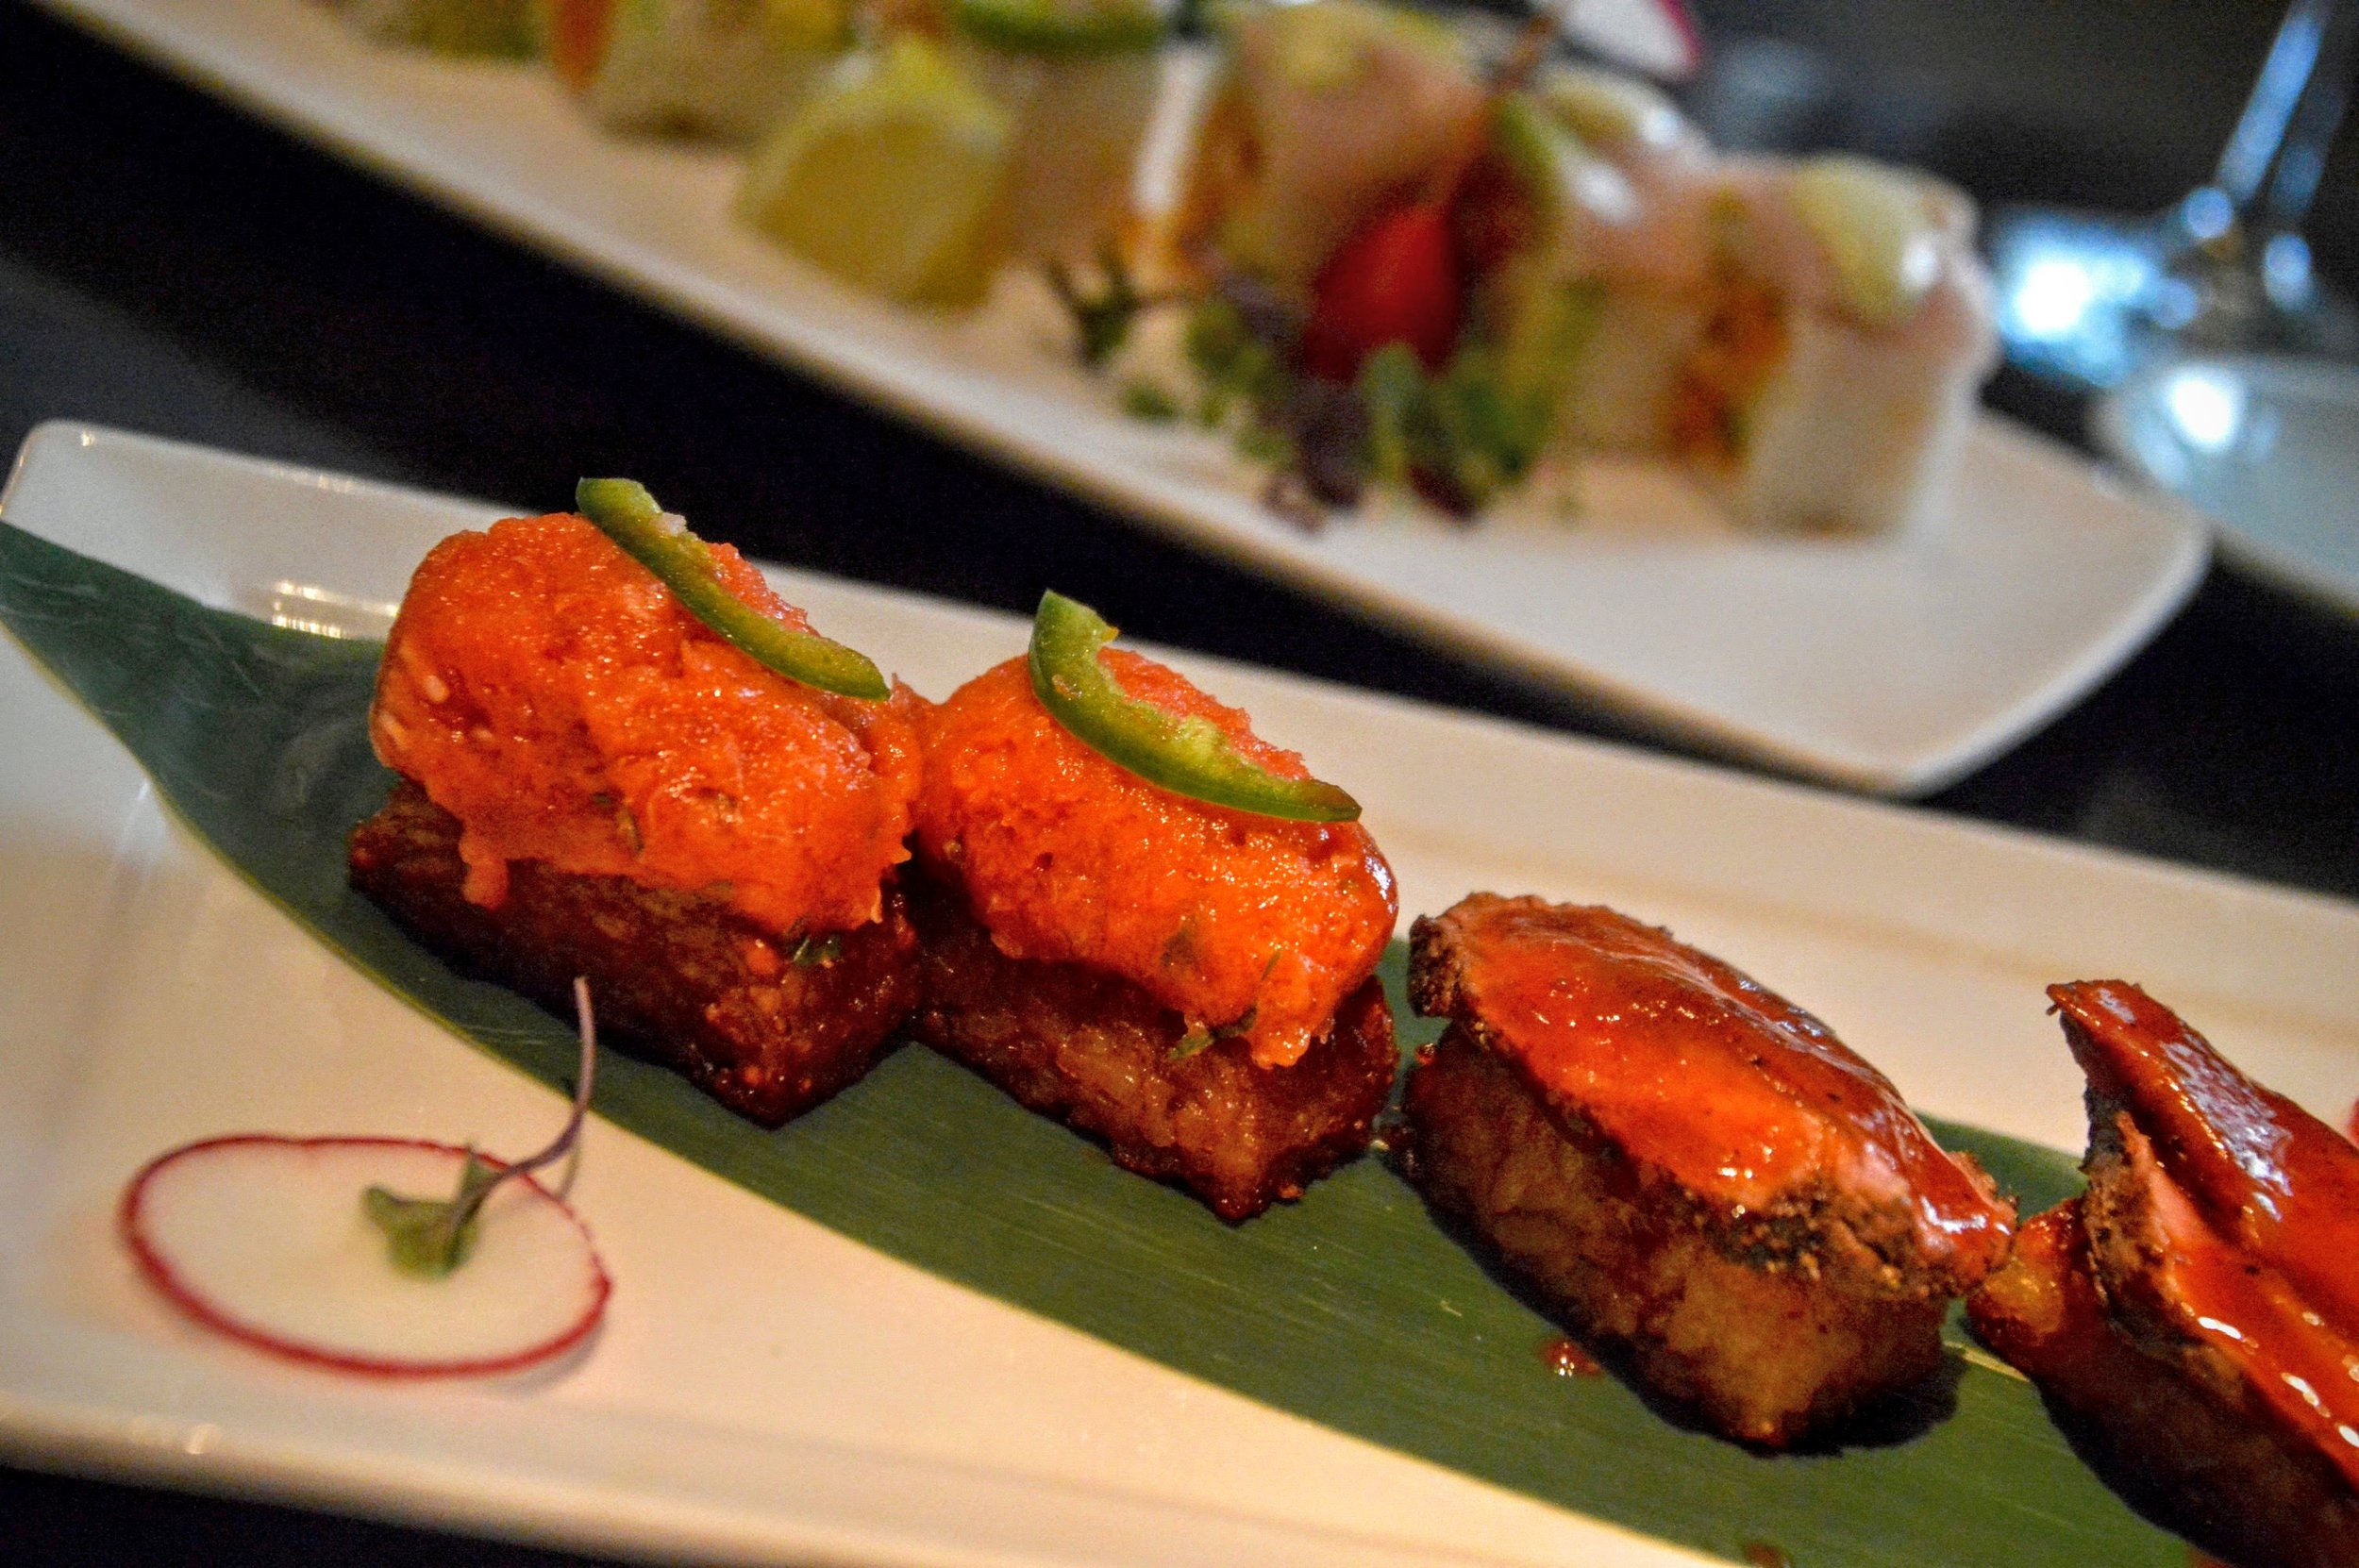 Koi Crispy Rice    - Topped with Spicy Tuna and Kobe Beef